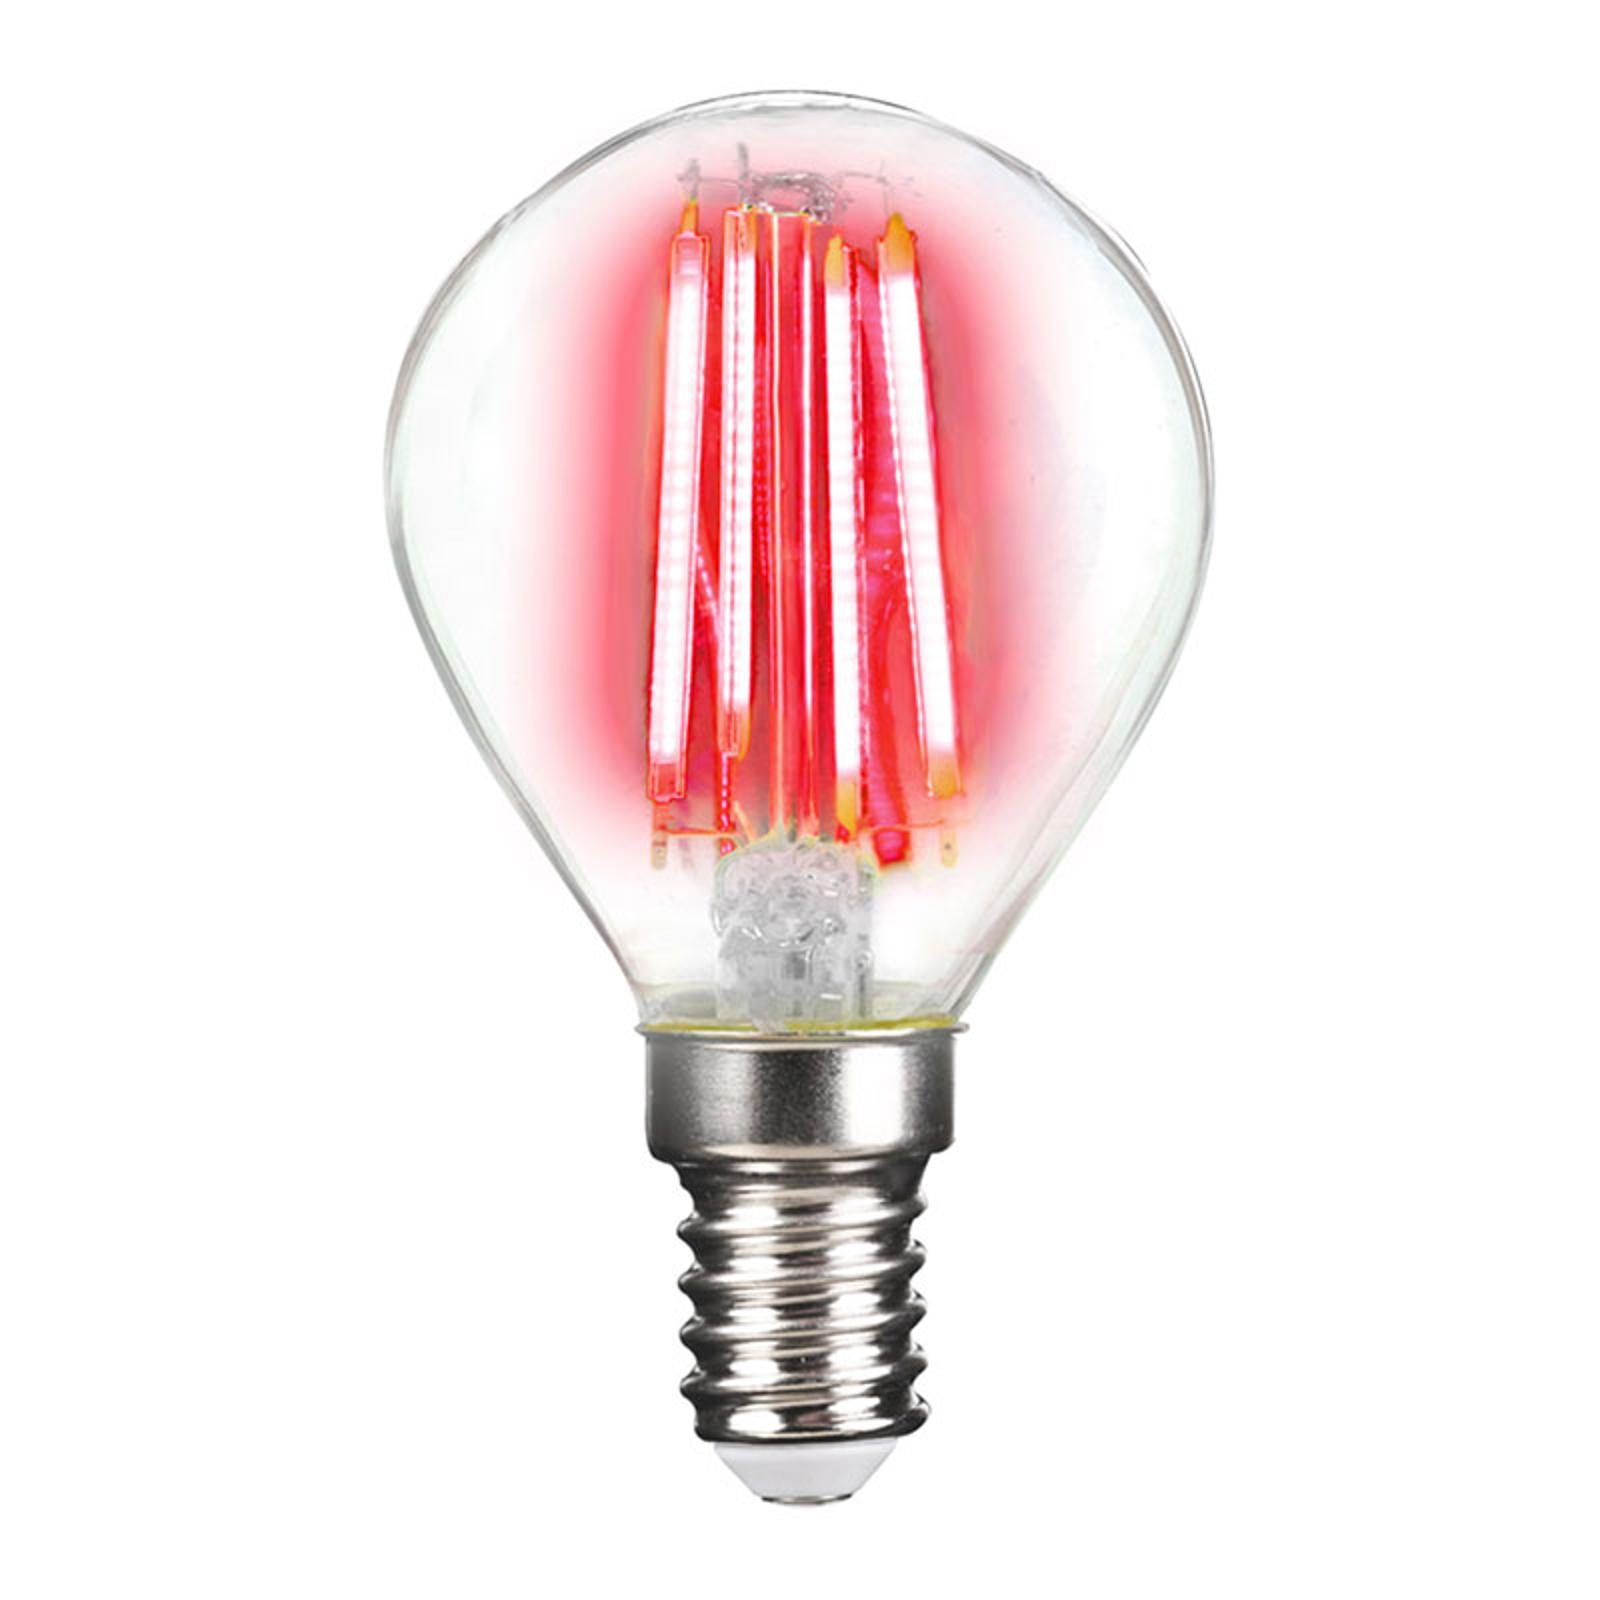 Lampadina LED E14 4W filamenti rosso